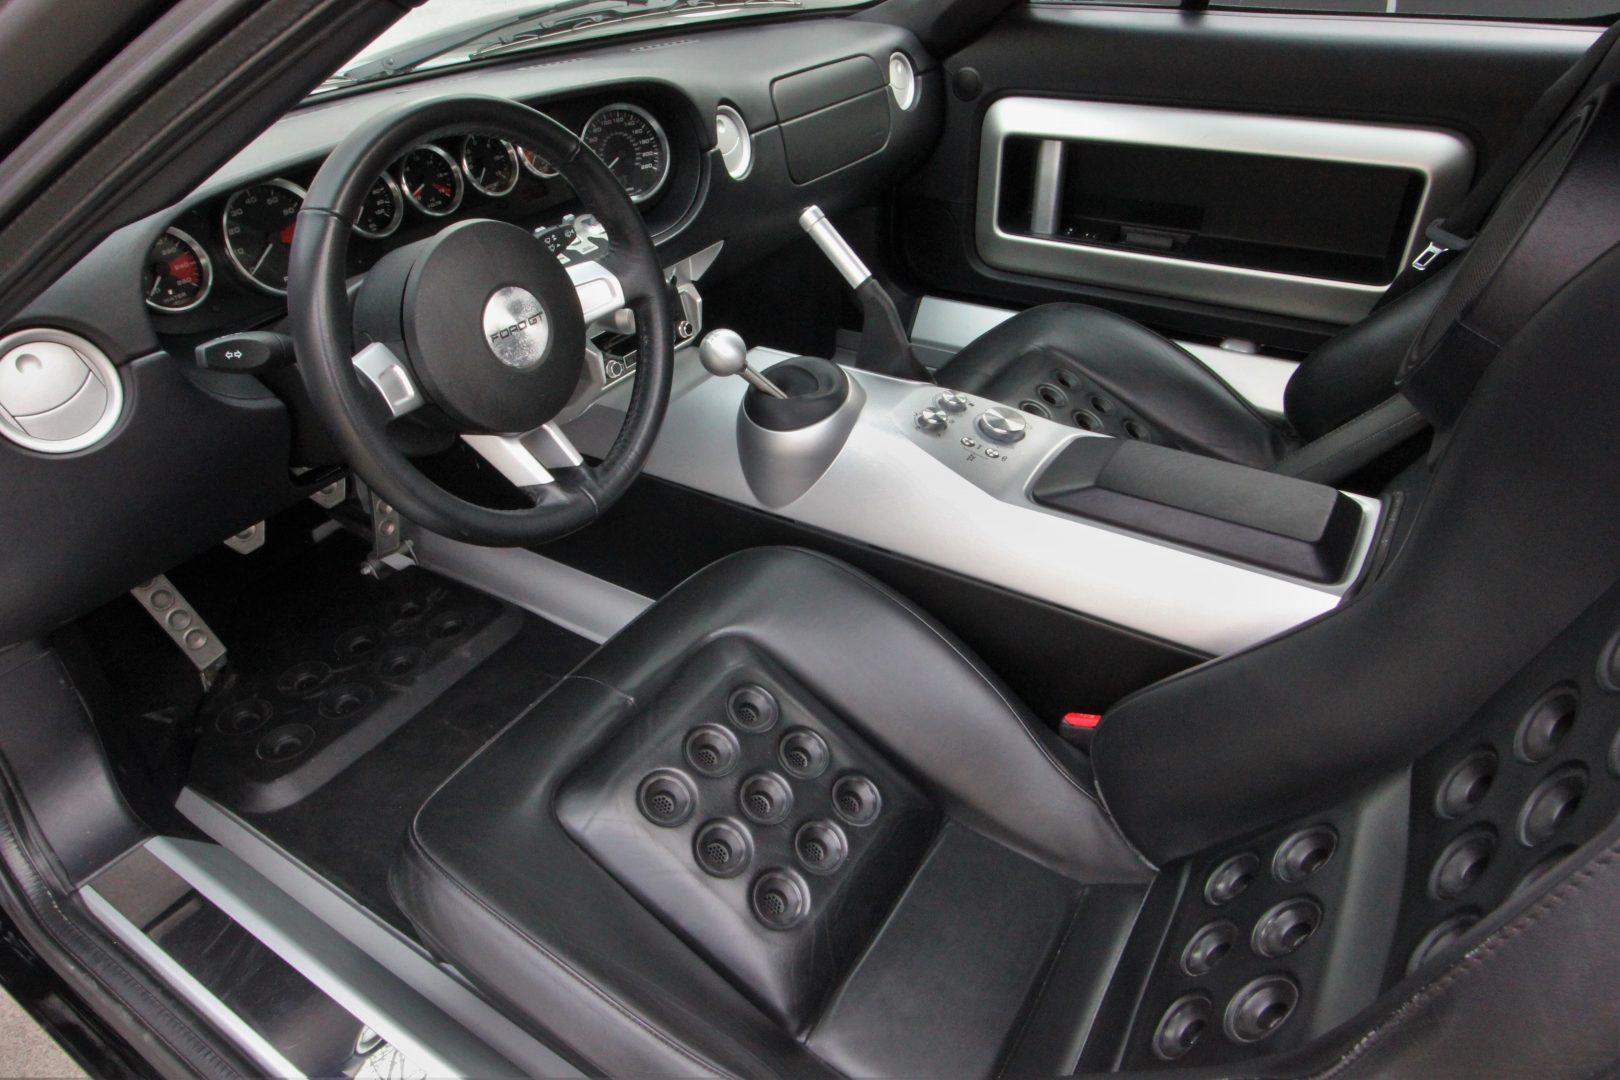 AIL Ford GT 5.4L V8 Supercharger 11